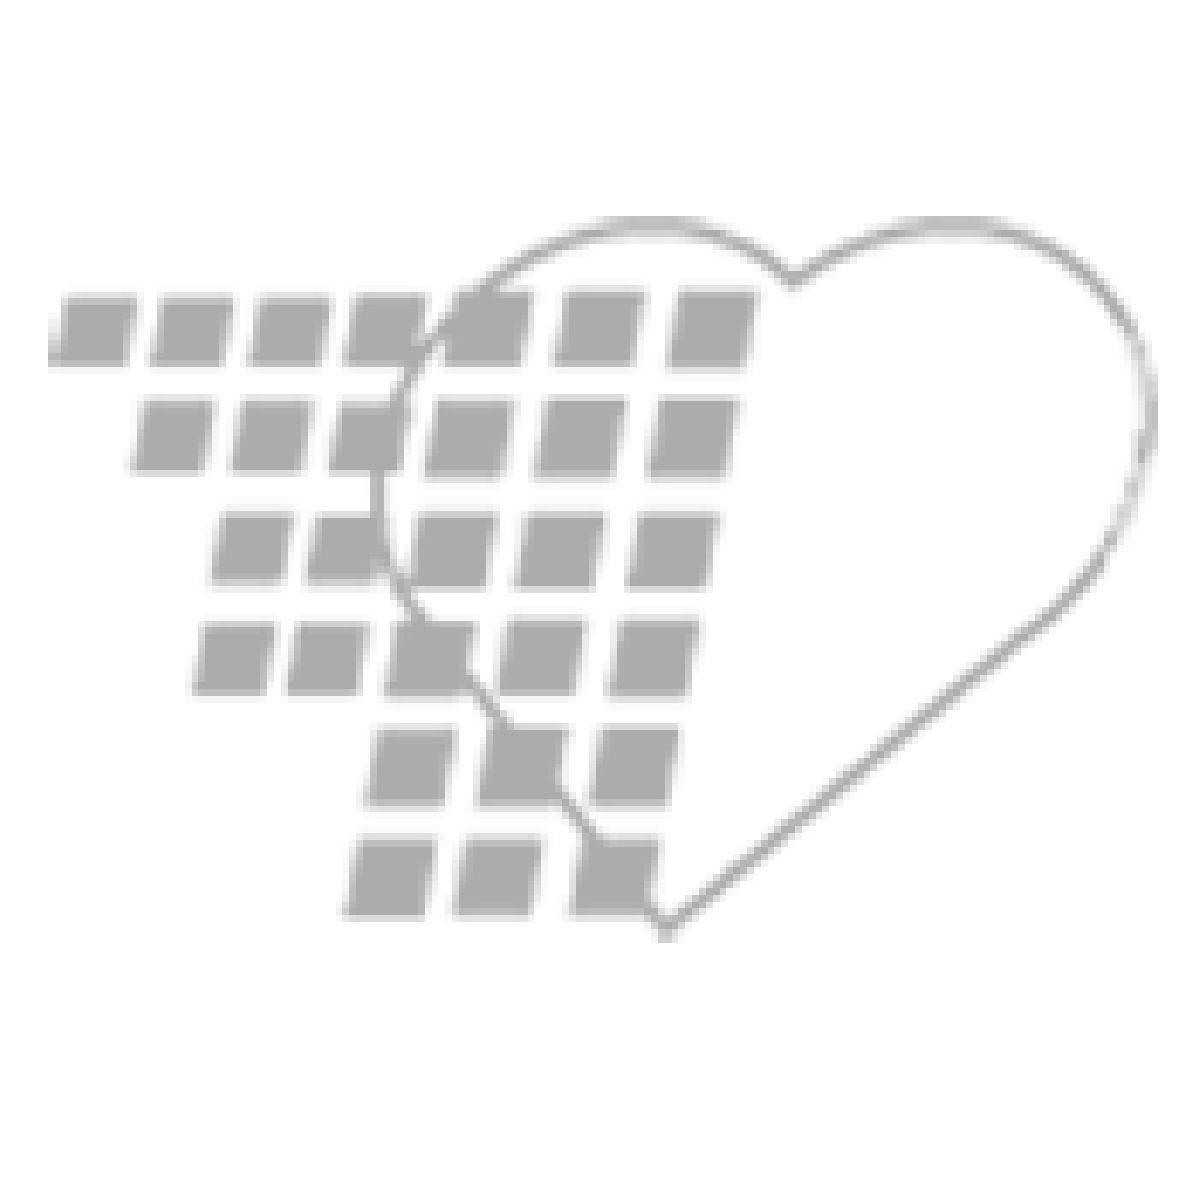 02-44-1010 Zoll AED Plus Defibrillator